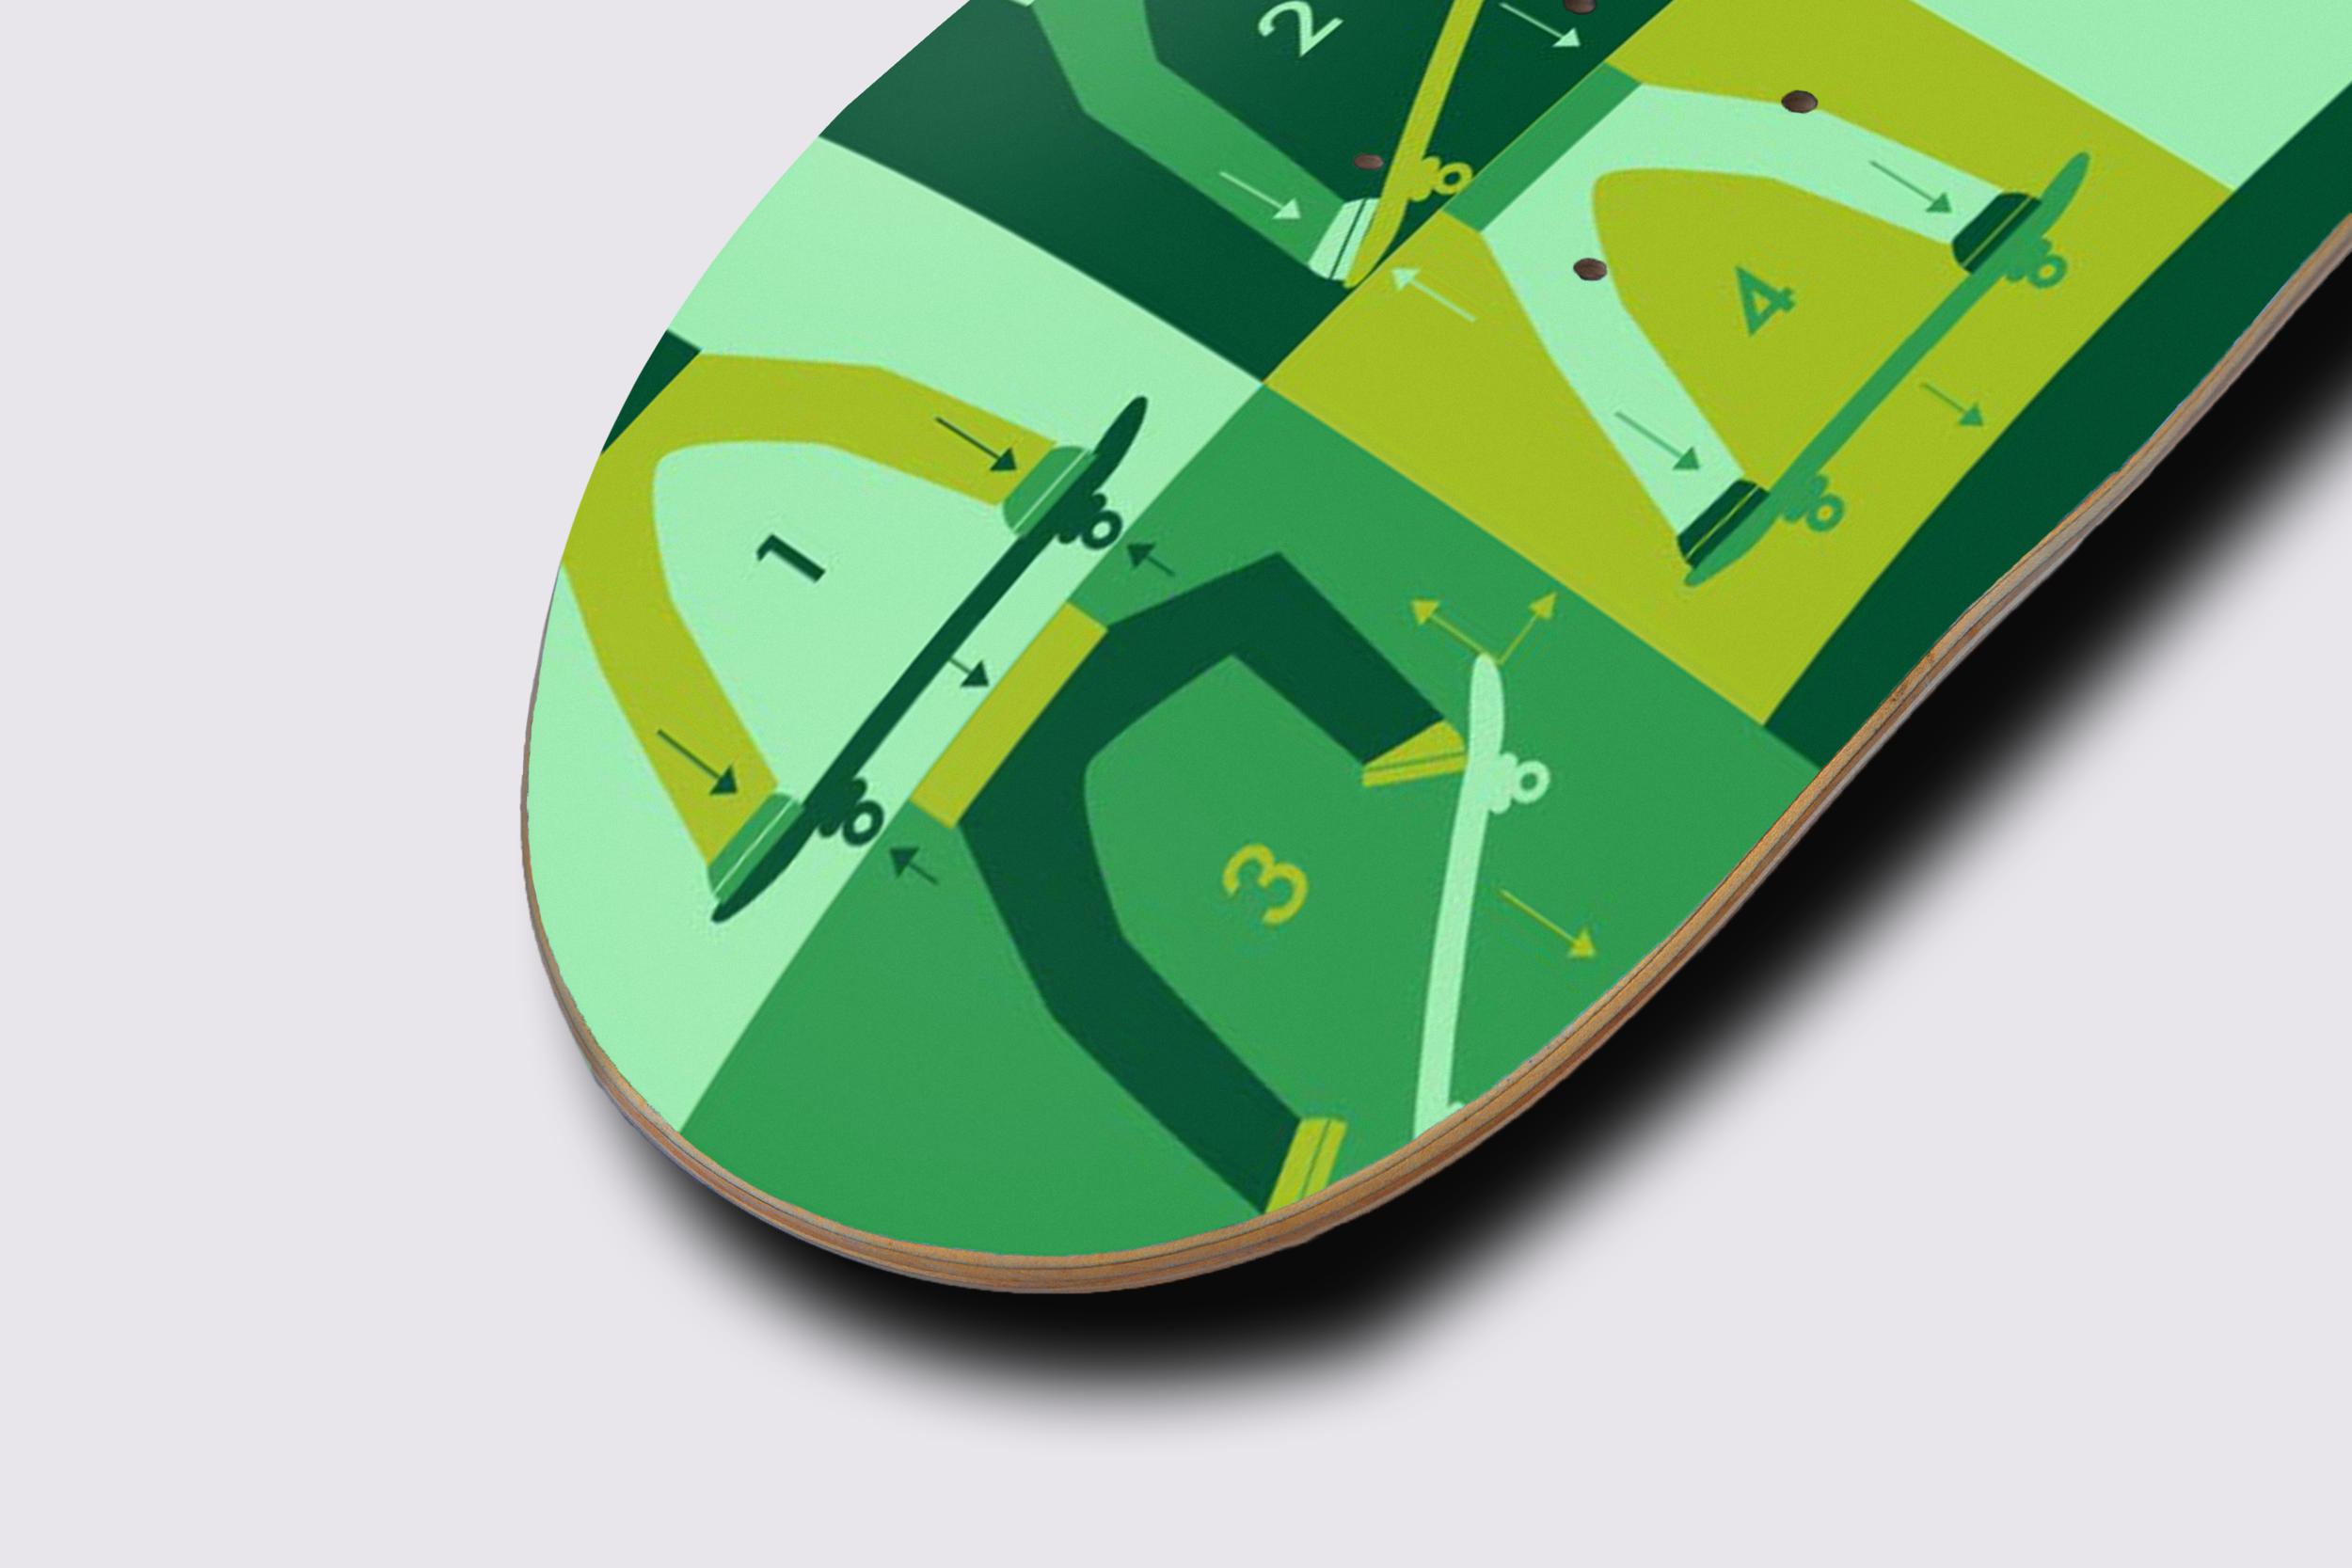 Skateboard_photo.png